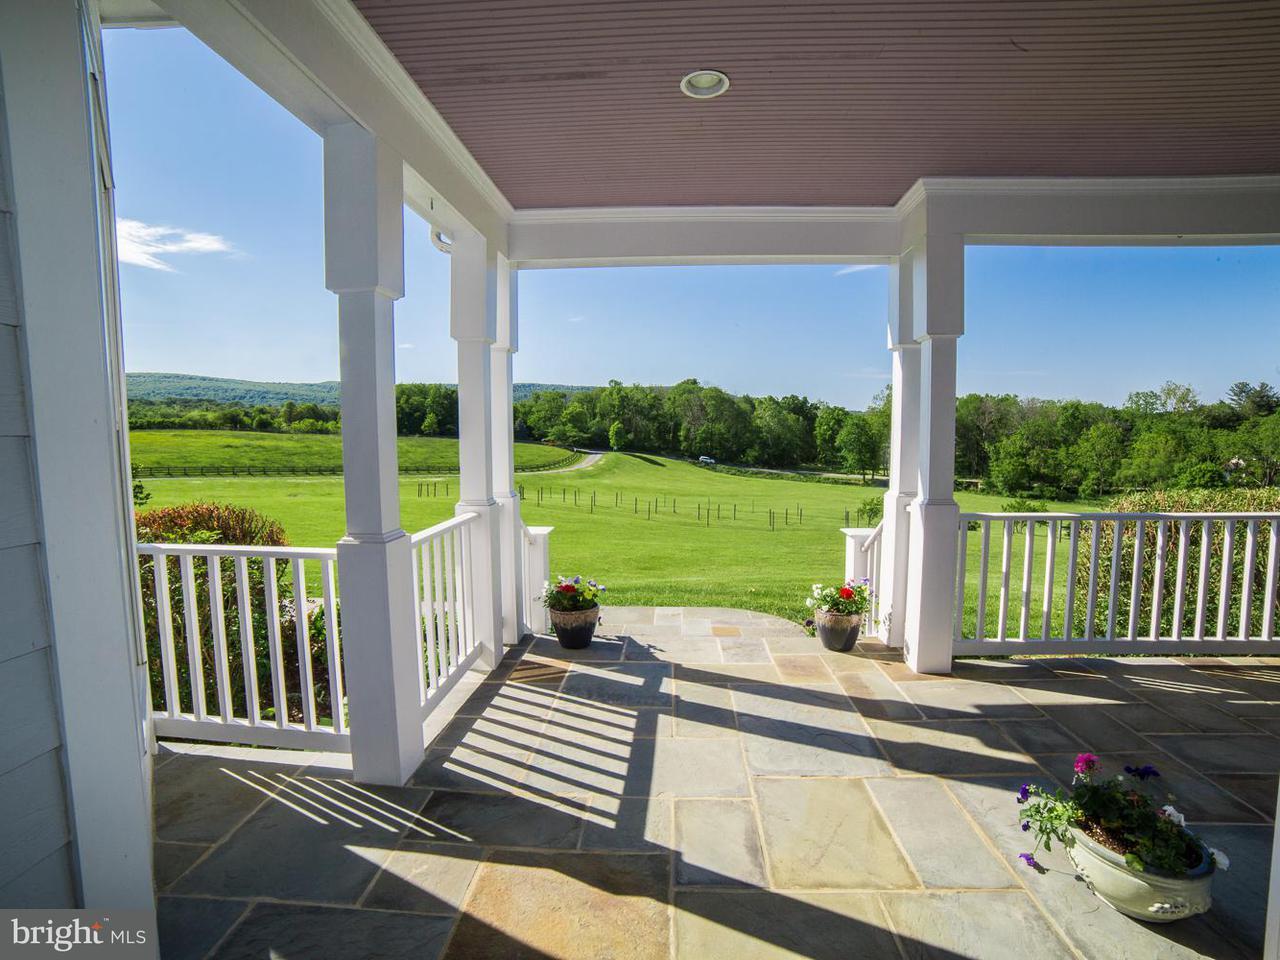 獨棟家庭住宅 為 出售 在 14868 CIDER MILL Road 14868 CIDER MILL Road Purcellville, 弗吉尼亞州 20132 美國